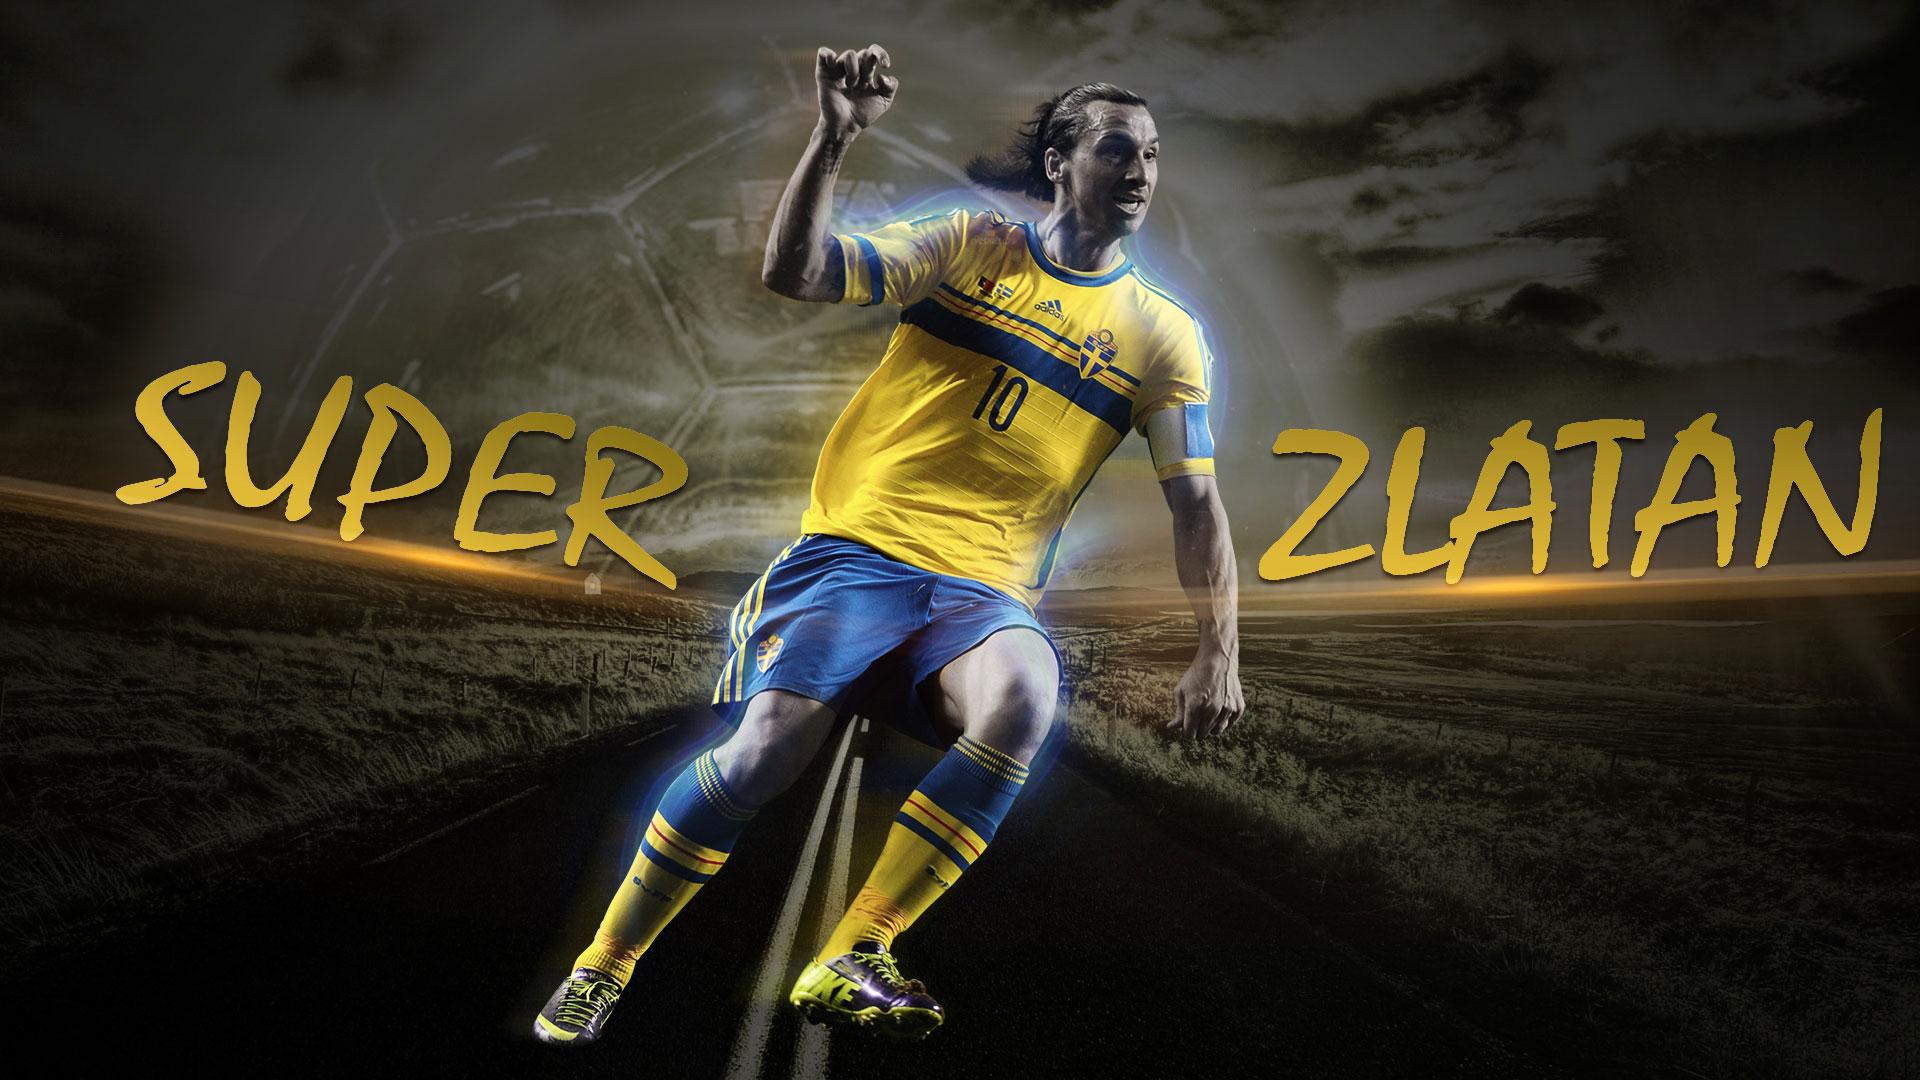 Zlatan Ibrahimovic större än Gud?